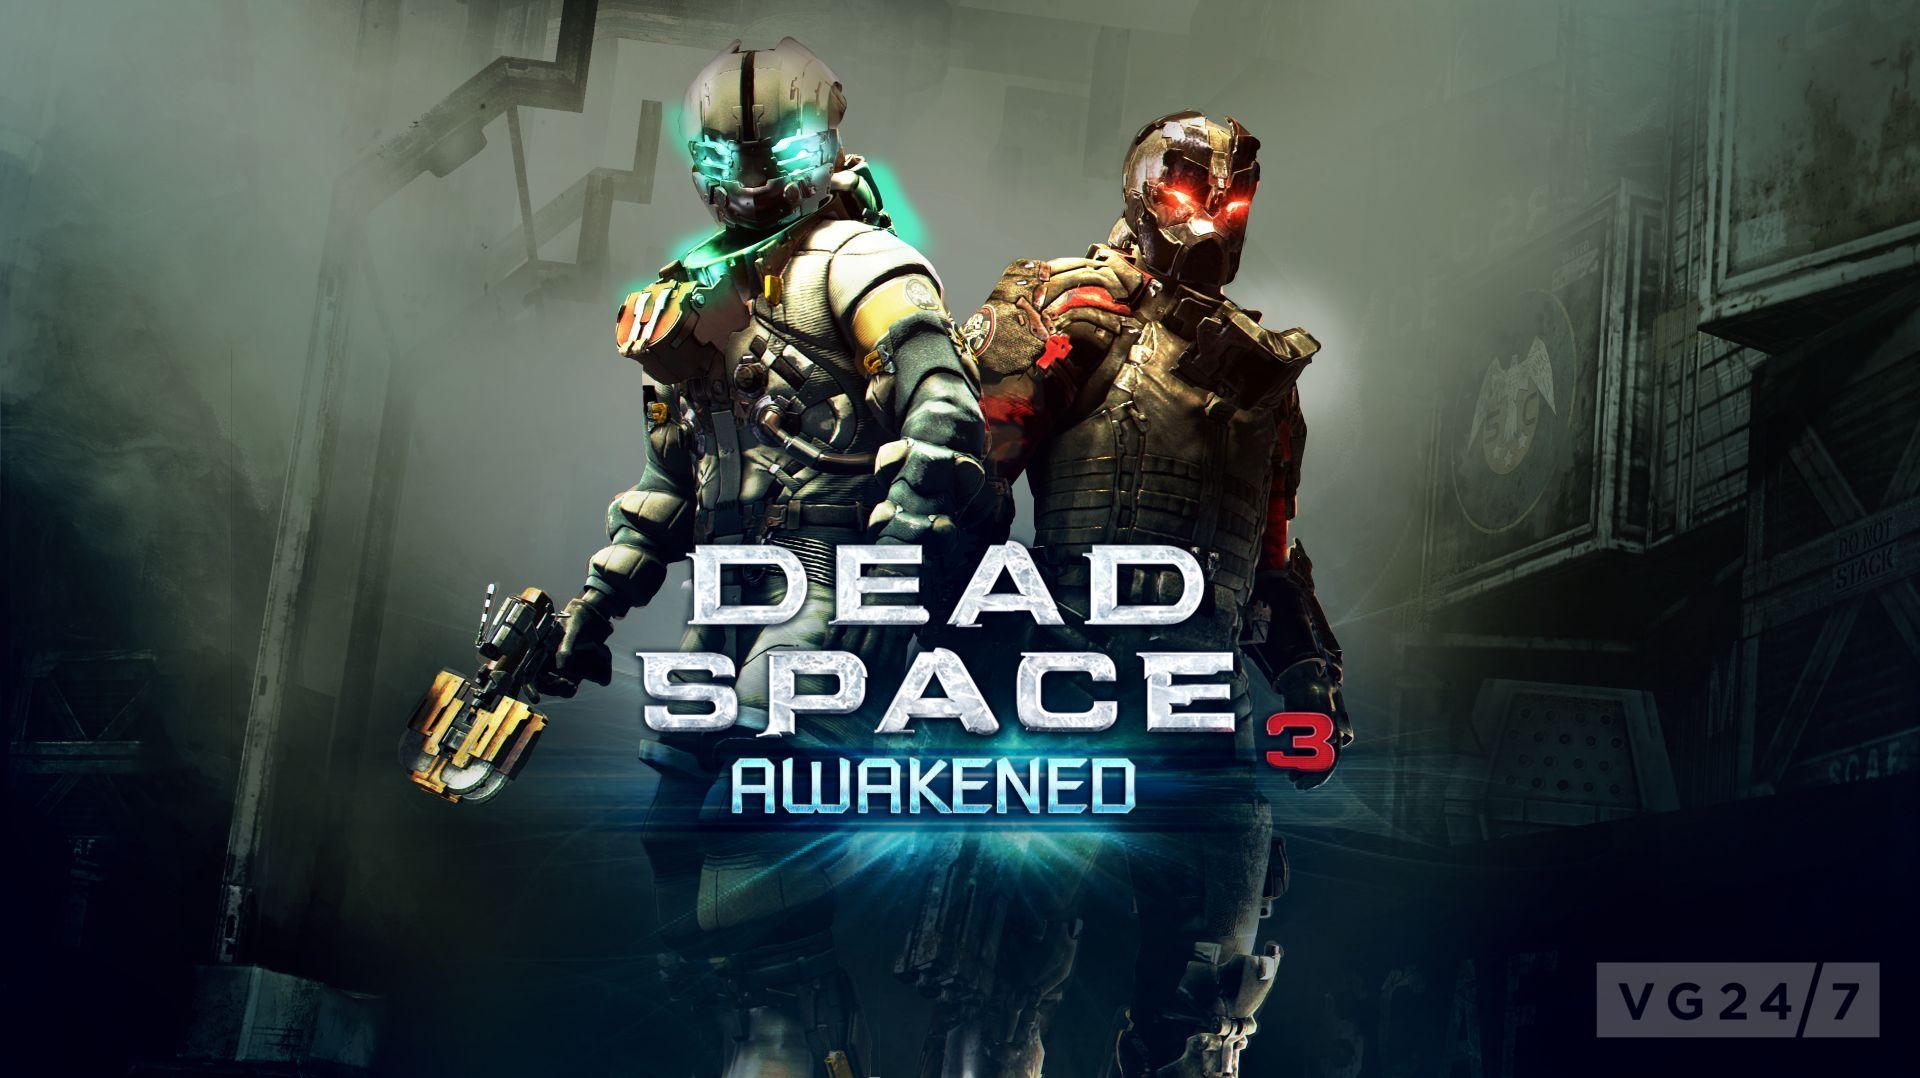 Dead-Space-3-Awakened-1